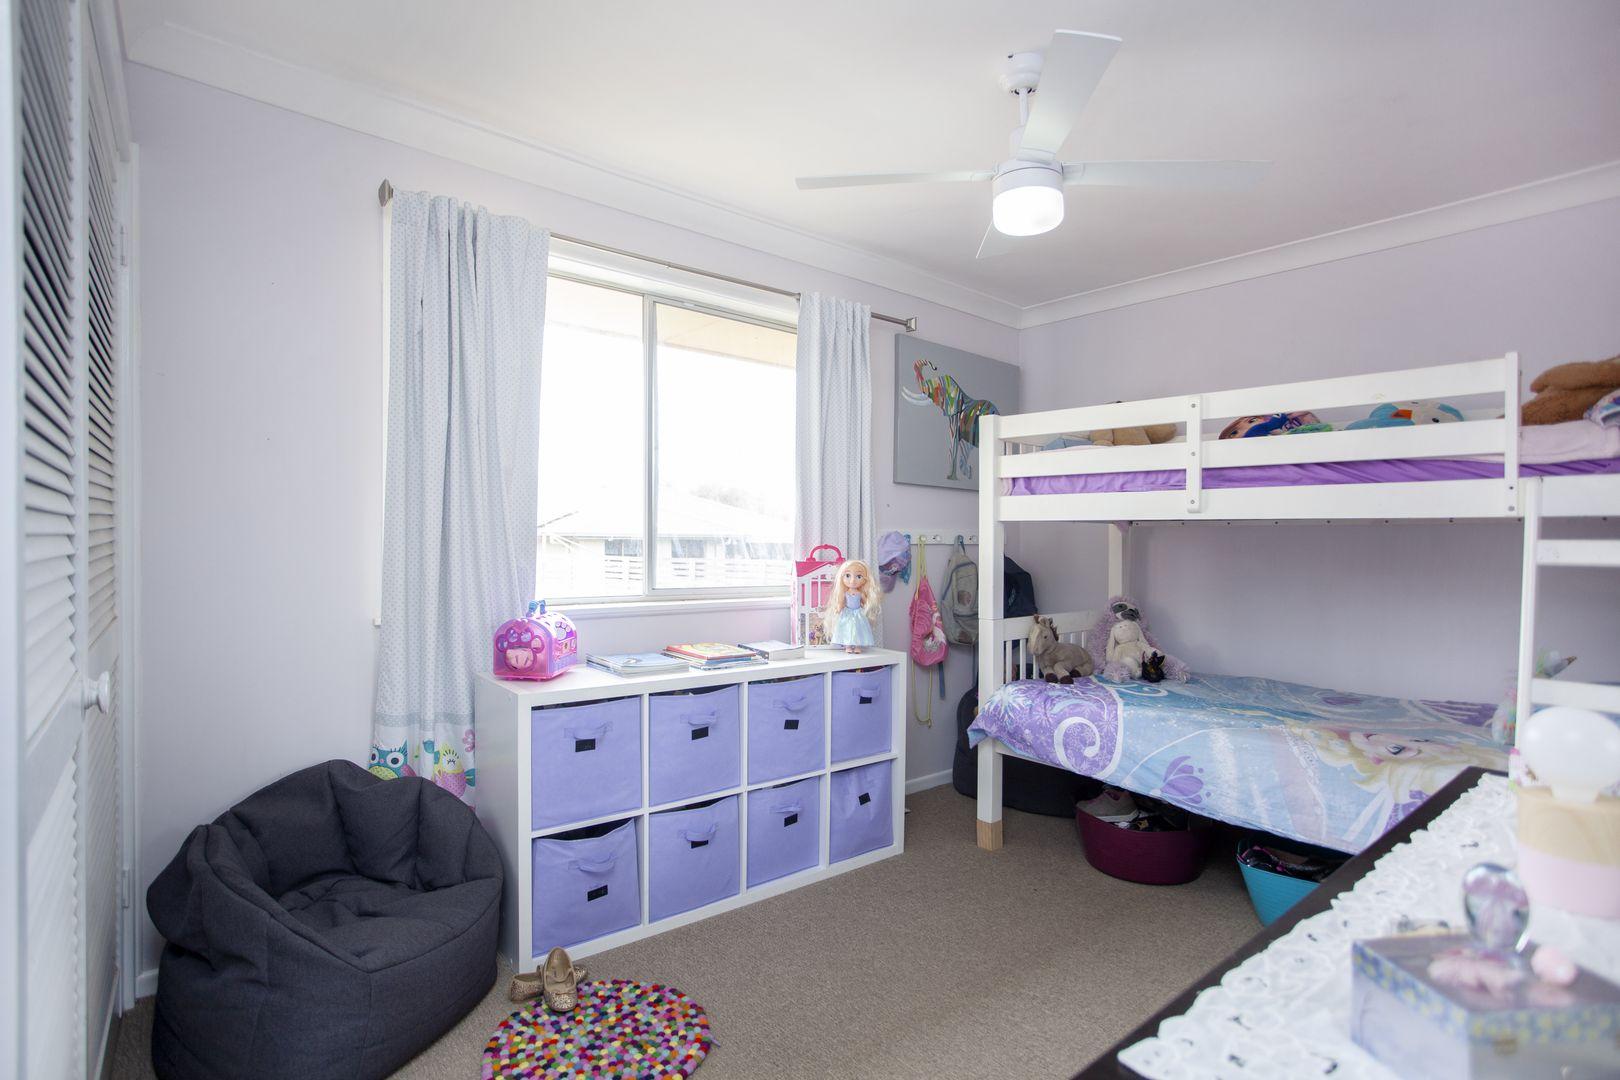 4 Grevillea Close, Taree NSW 2430, Image 2